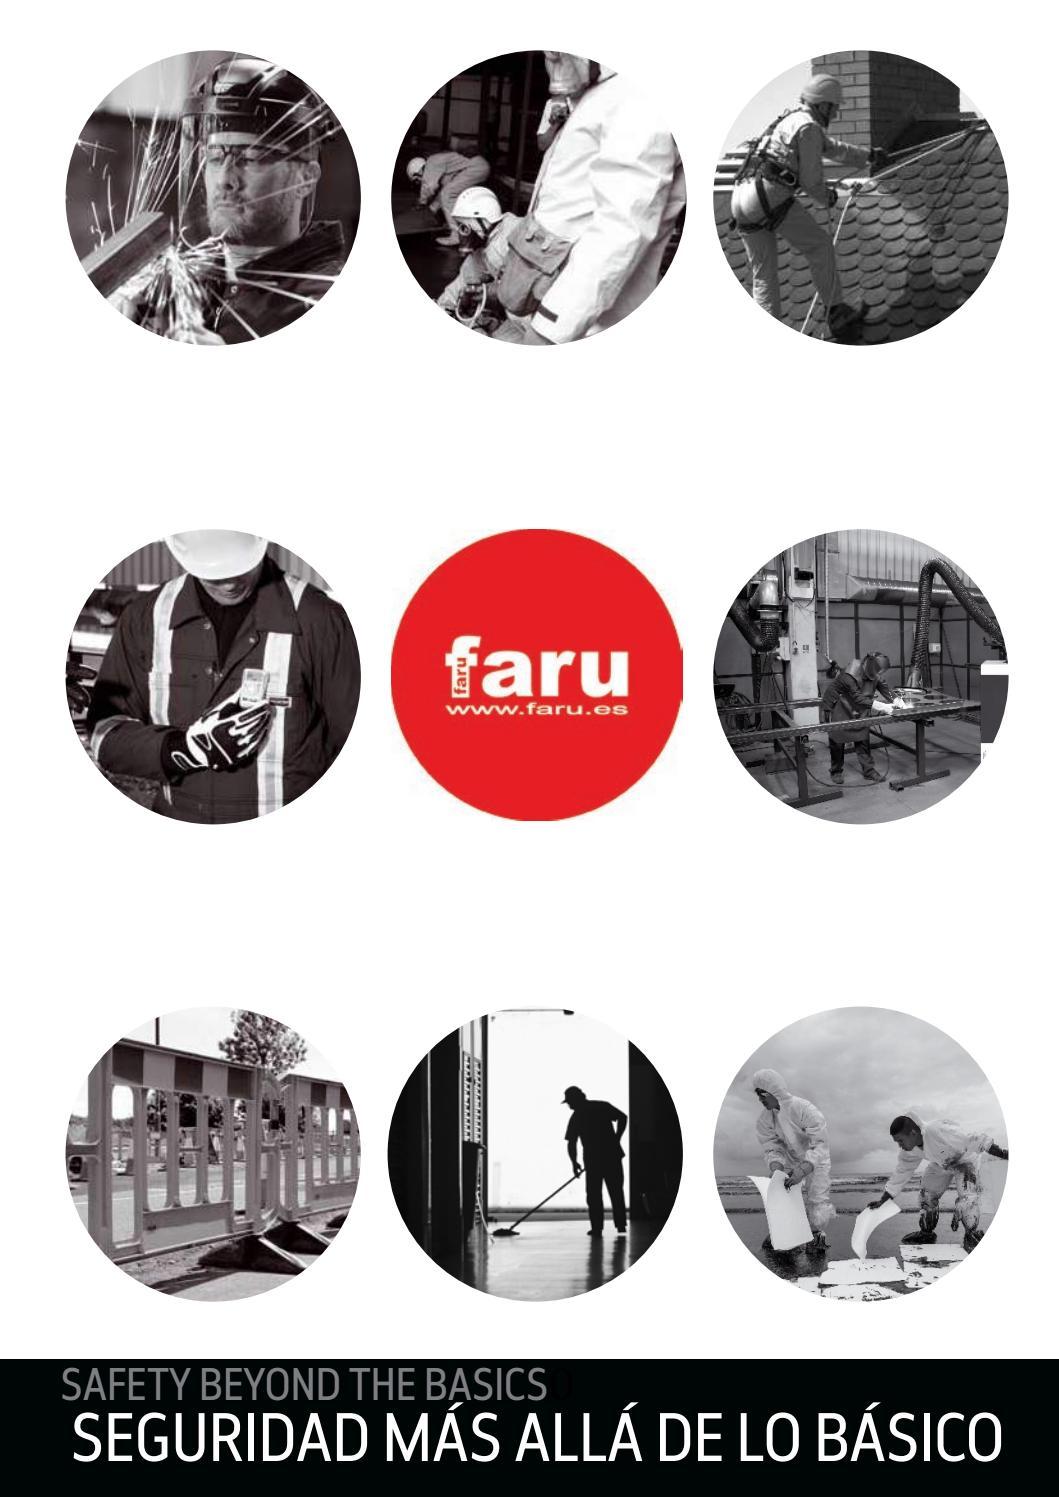 EPIS y Uniformes ICOM Textil Catalogo FARU EPIS SEGURIDAD by ICOM  Multiservicios - issuu 07aca8d1c54f